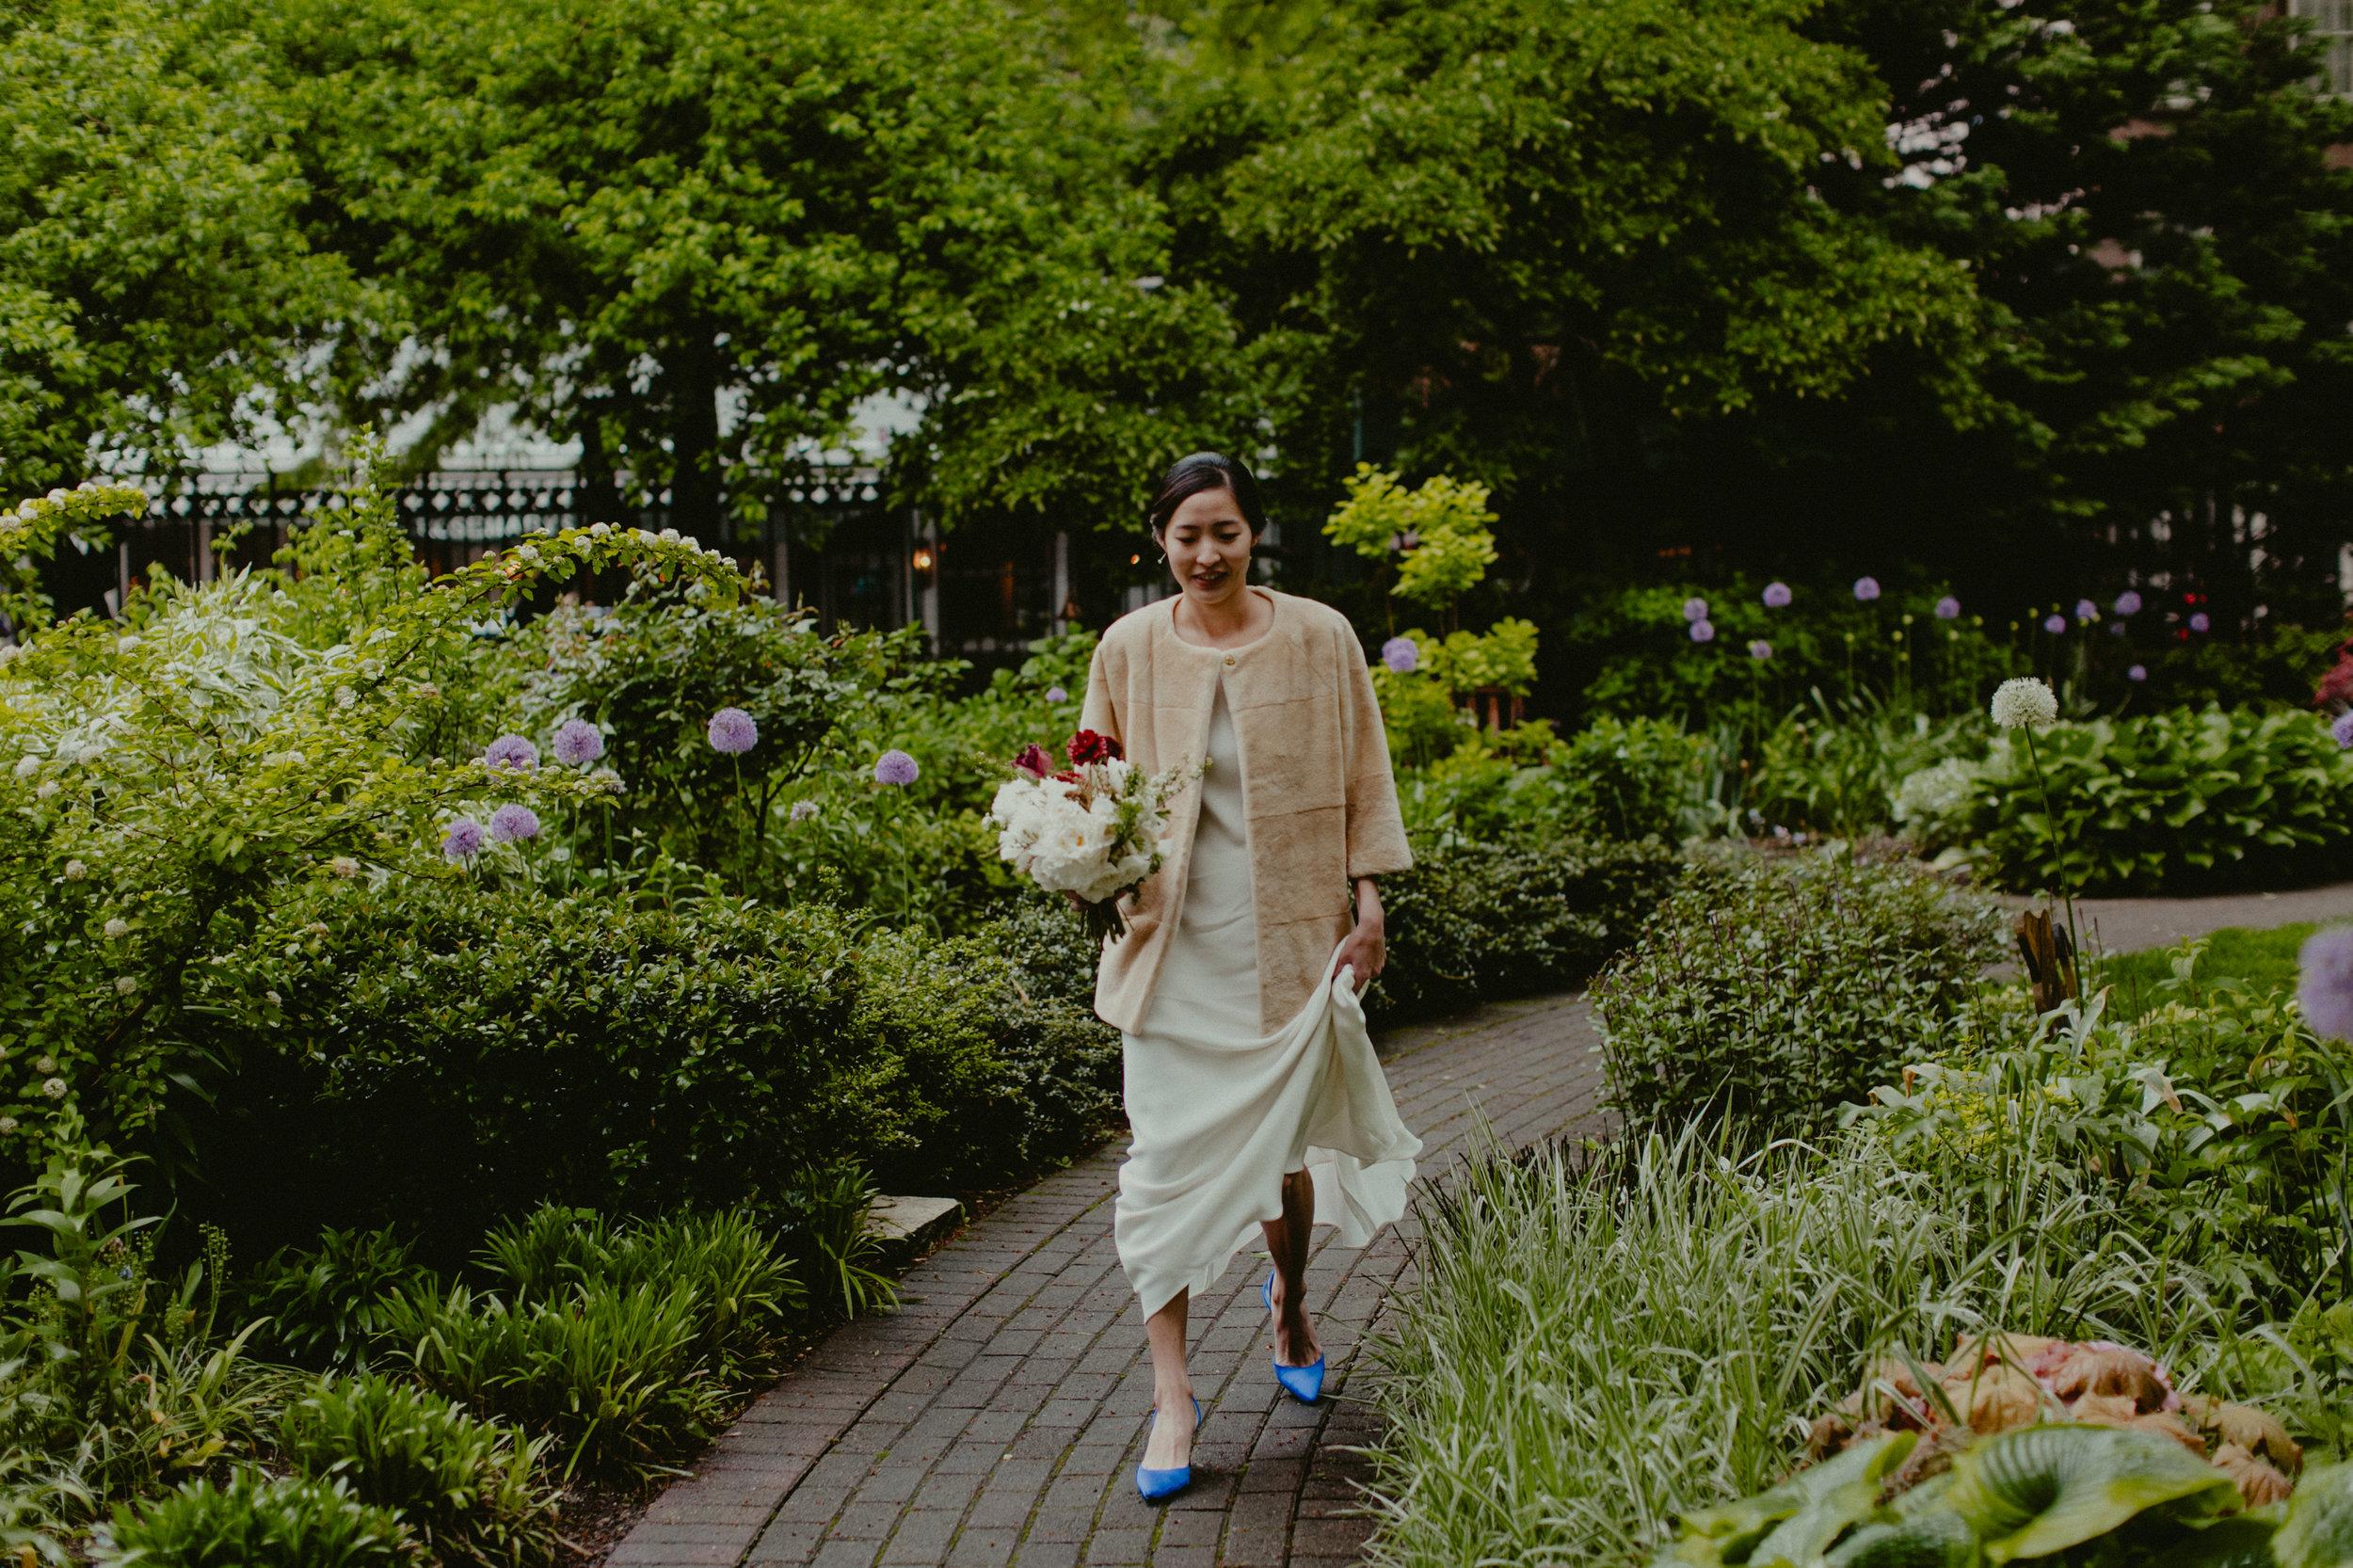 beekman hotel 444jefferson garden market wedding.JPG